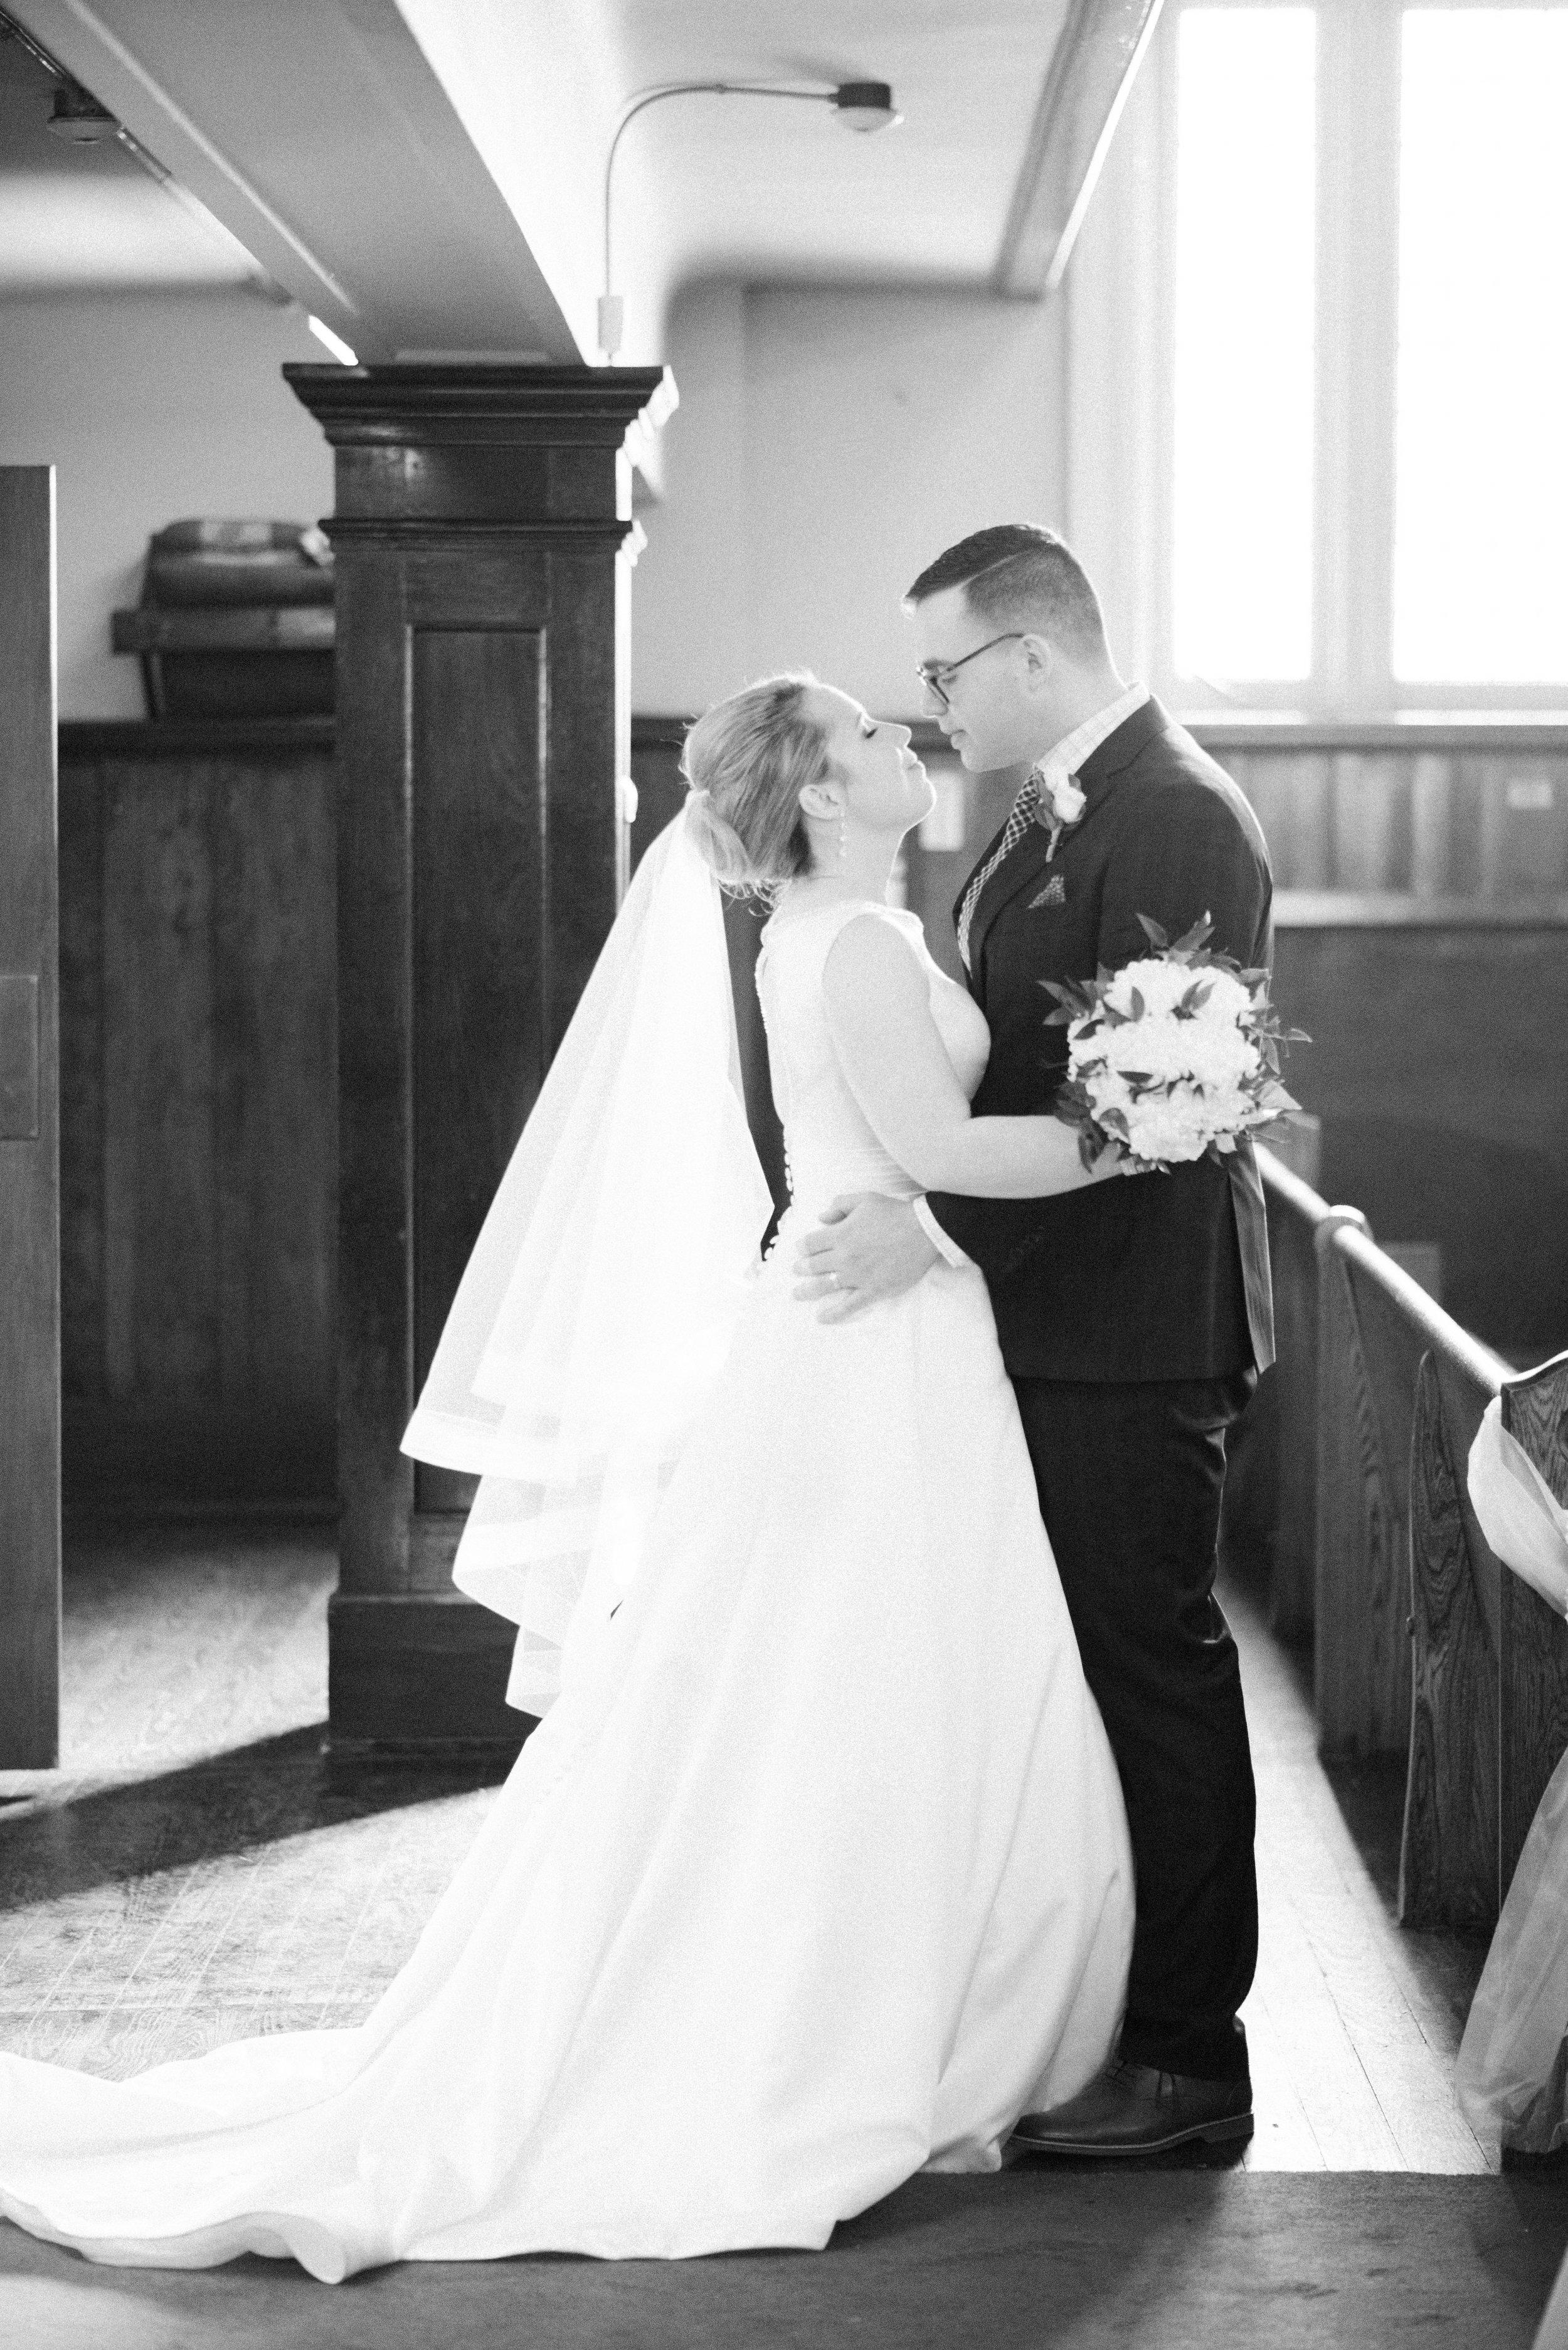 Meagan&Danny-WeddingDay